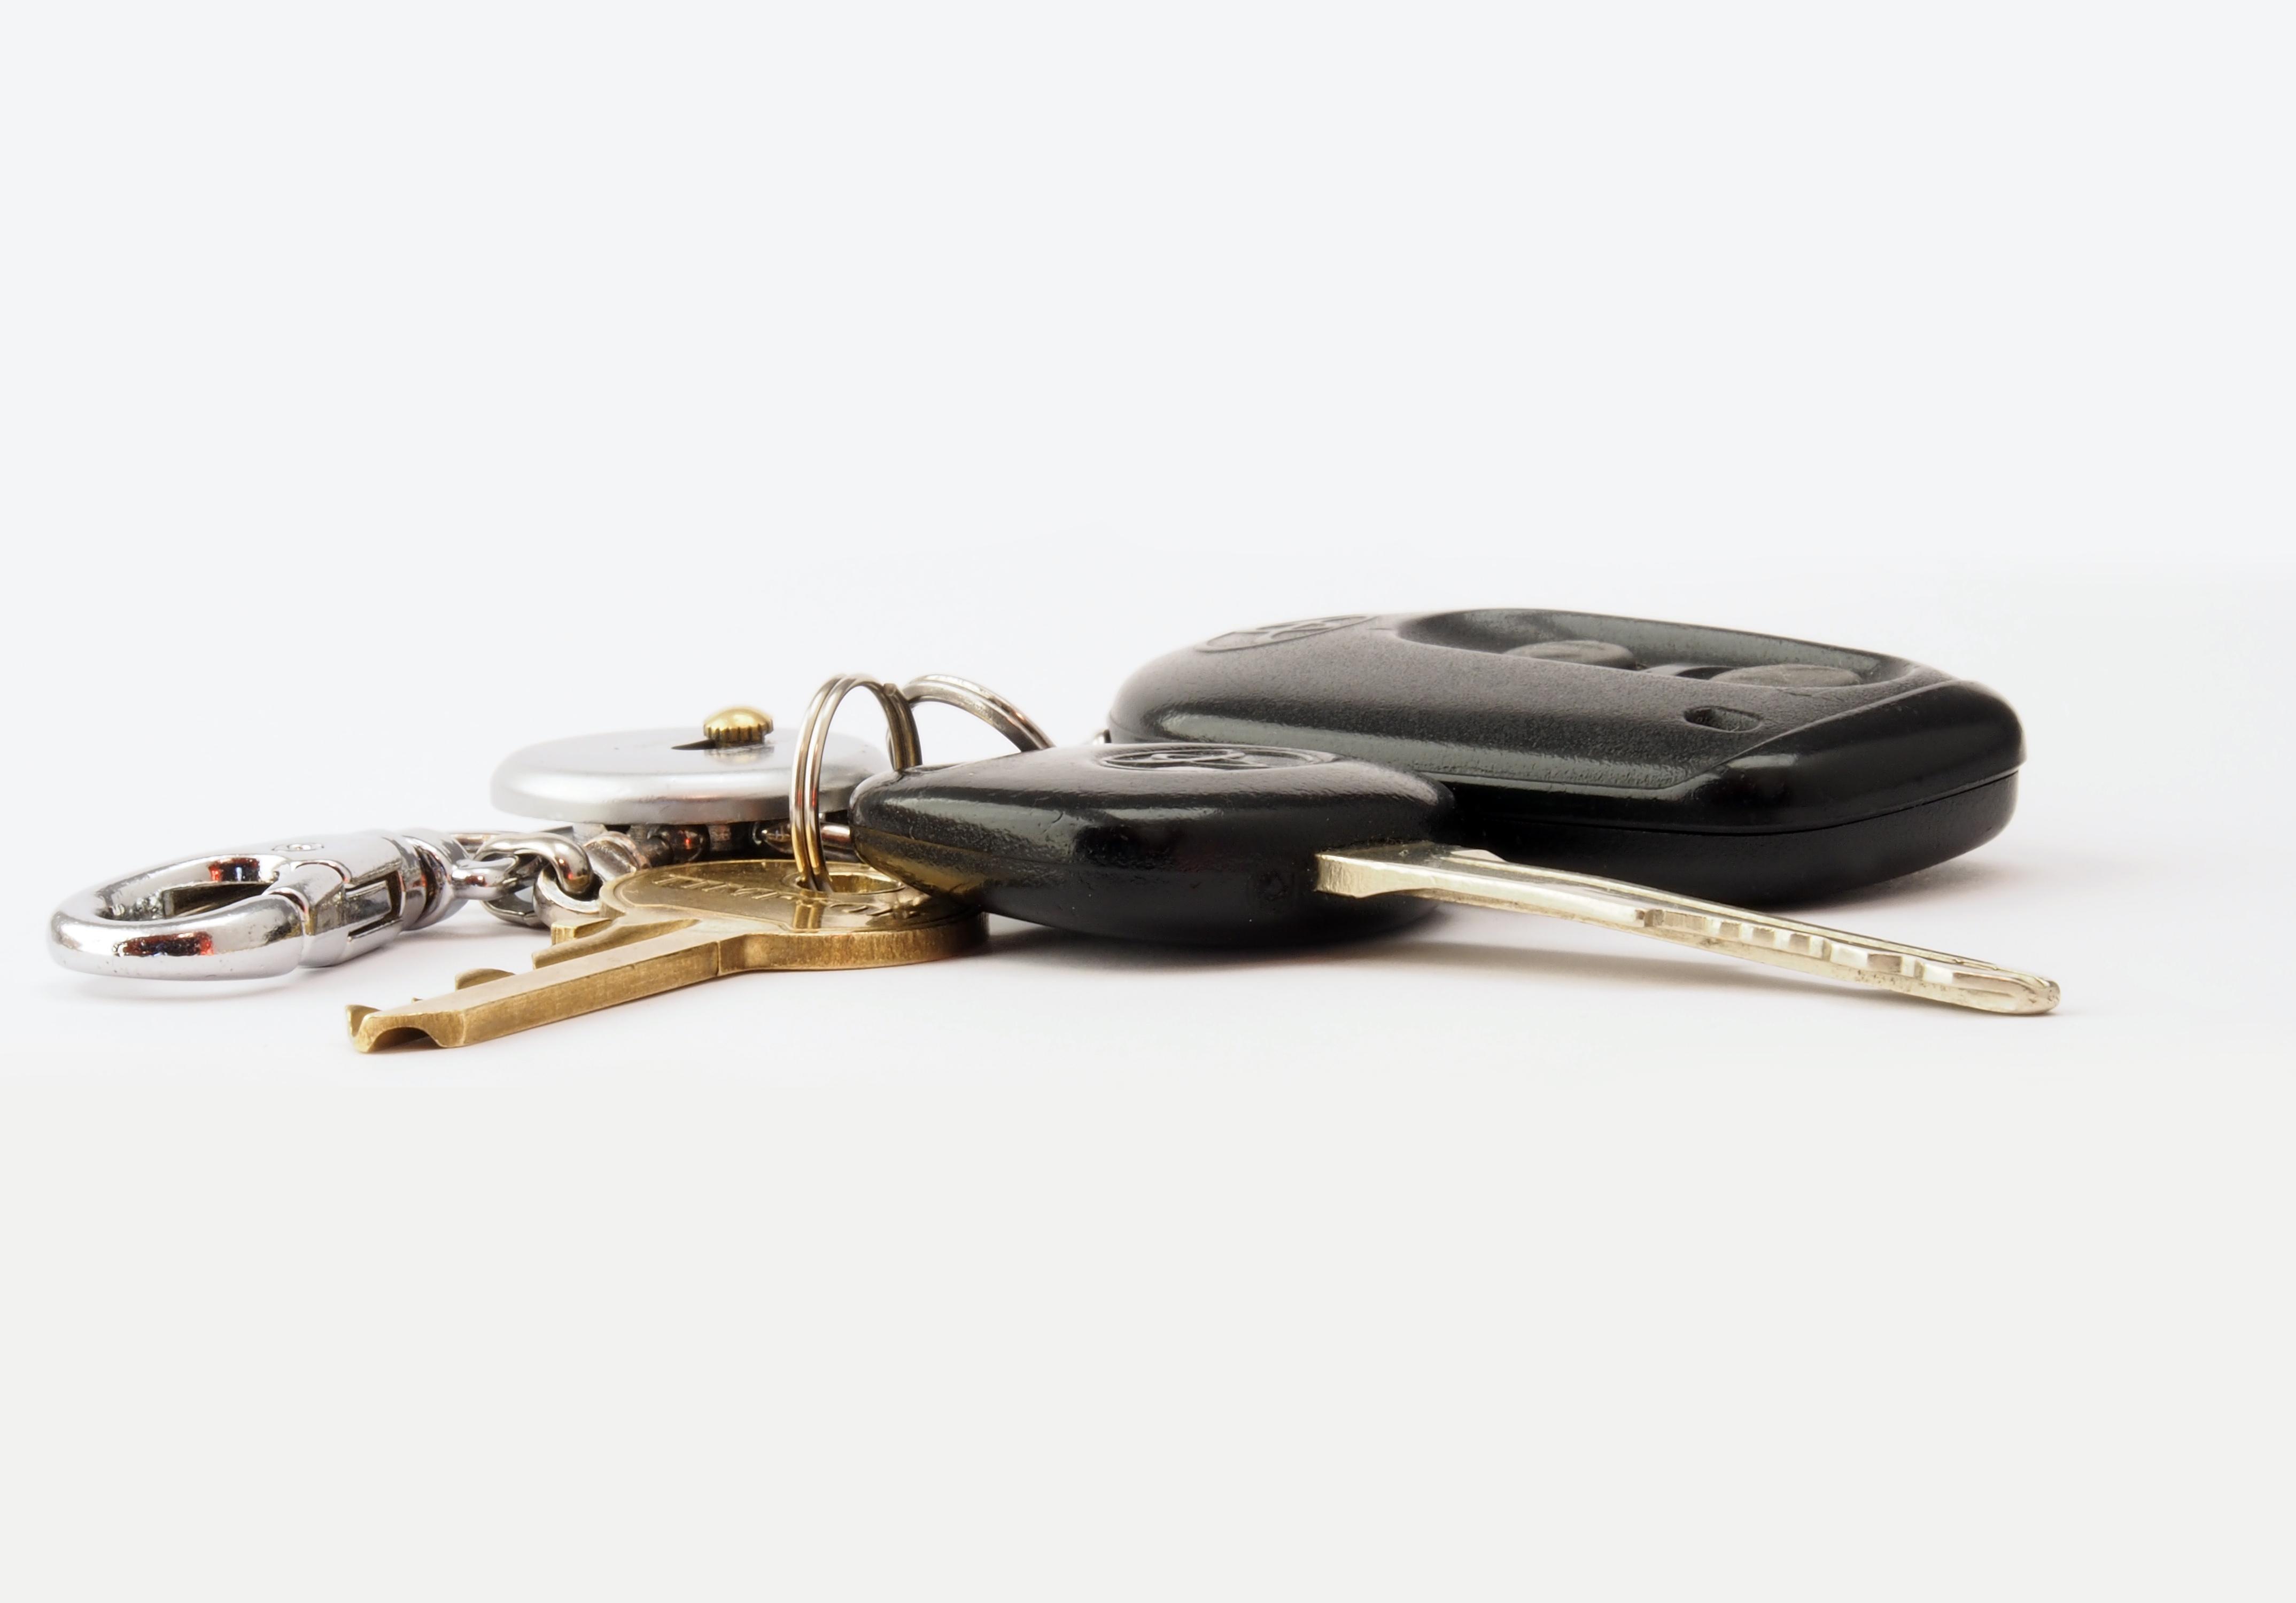 usucapione abbreviata beni mobili approfondimento avvocatoflash